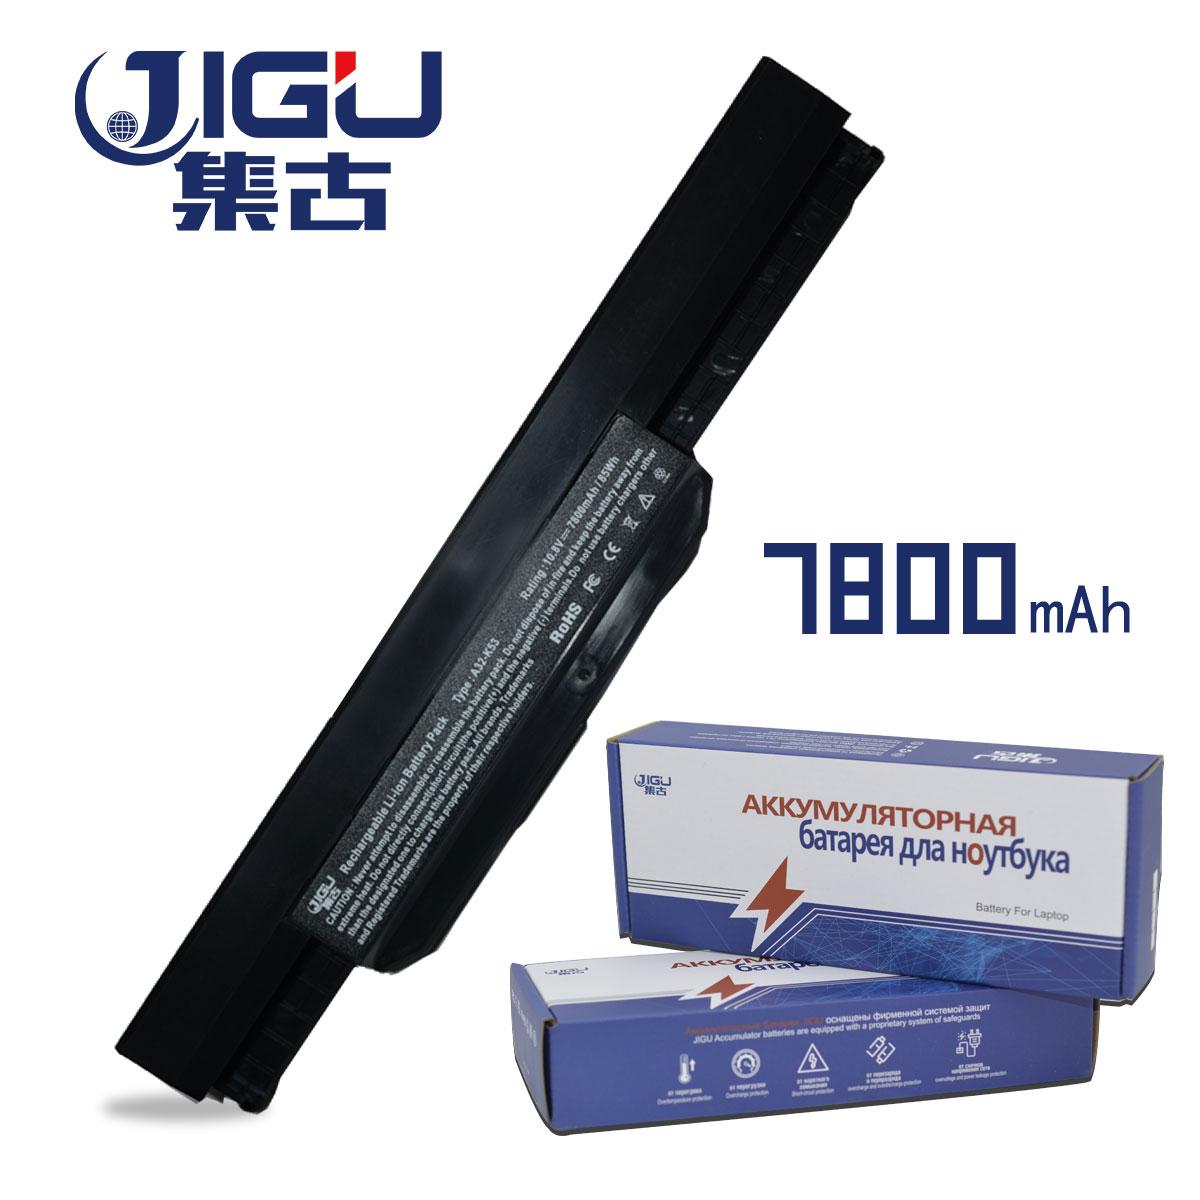 JIGU 7800 MAH Laptop Battery A32-K53 For Asus A43 A43E A53S K43E K43U K43S K43SJ K53 K53T K53S K53SV X54 X54H X44H